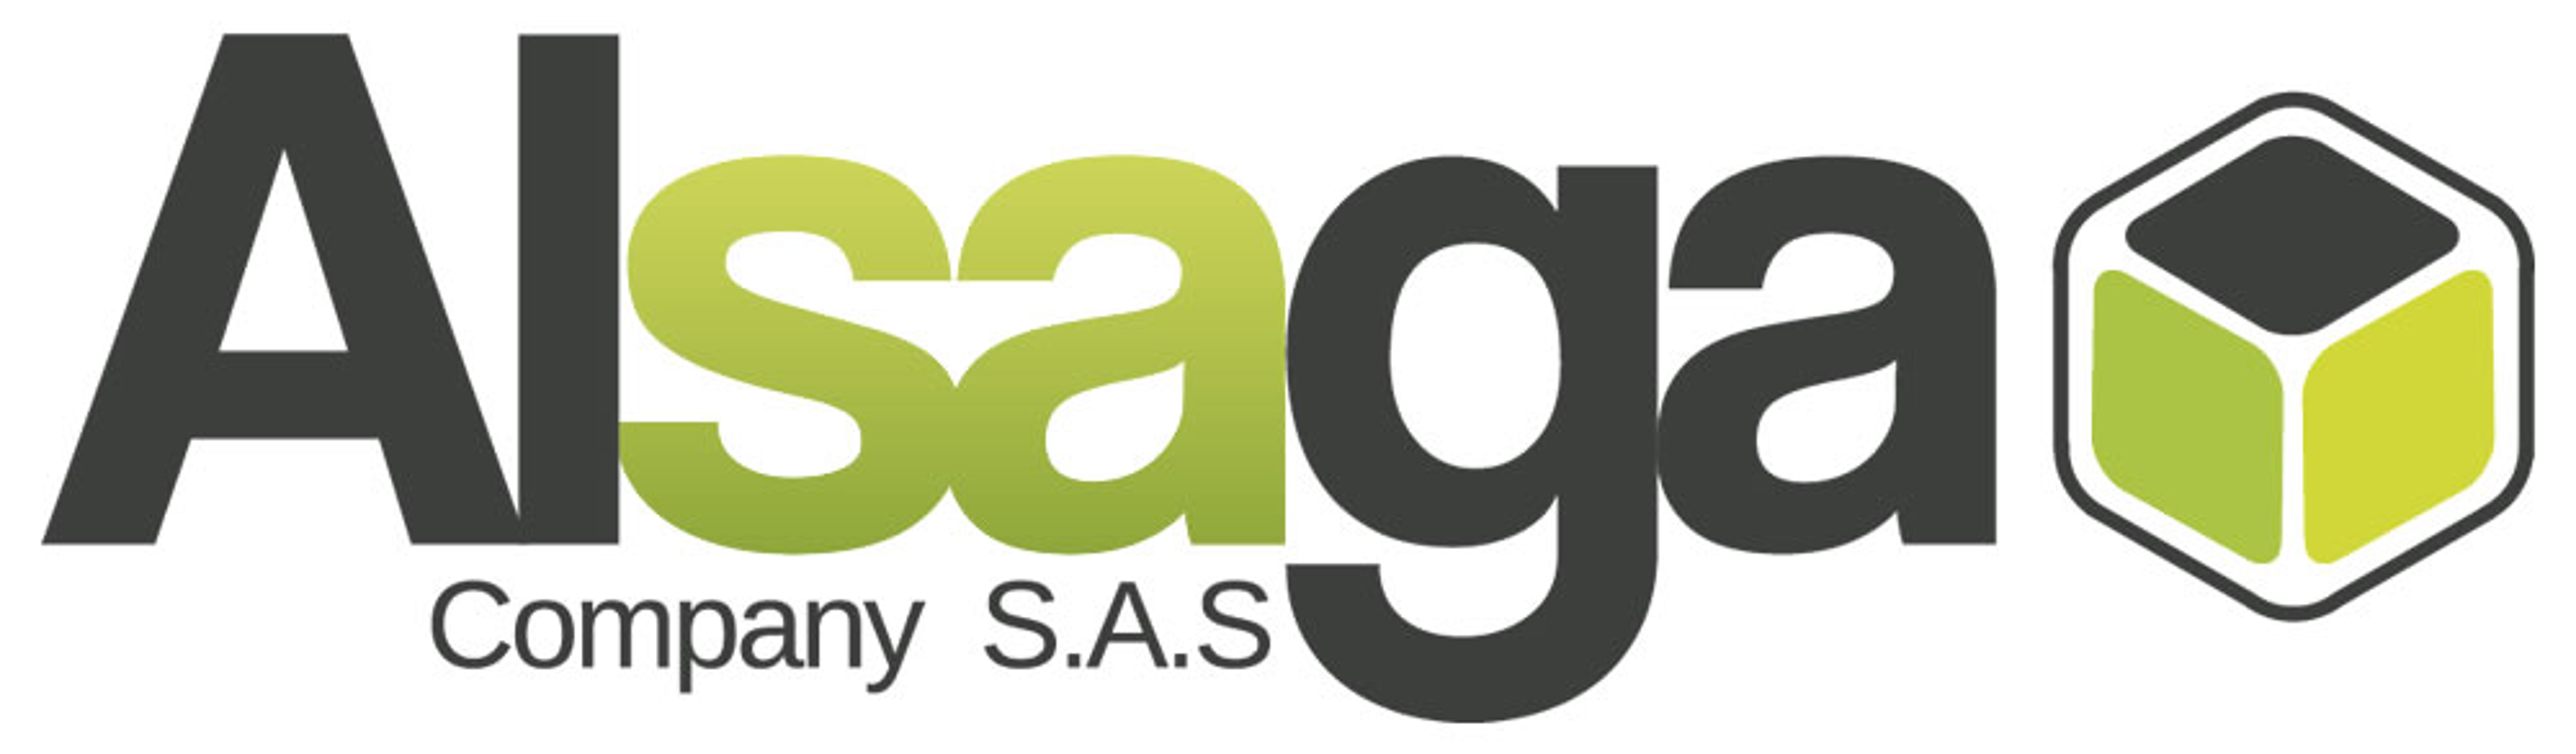 Alsaga Company